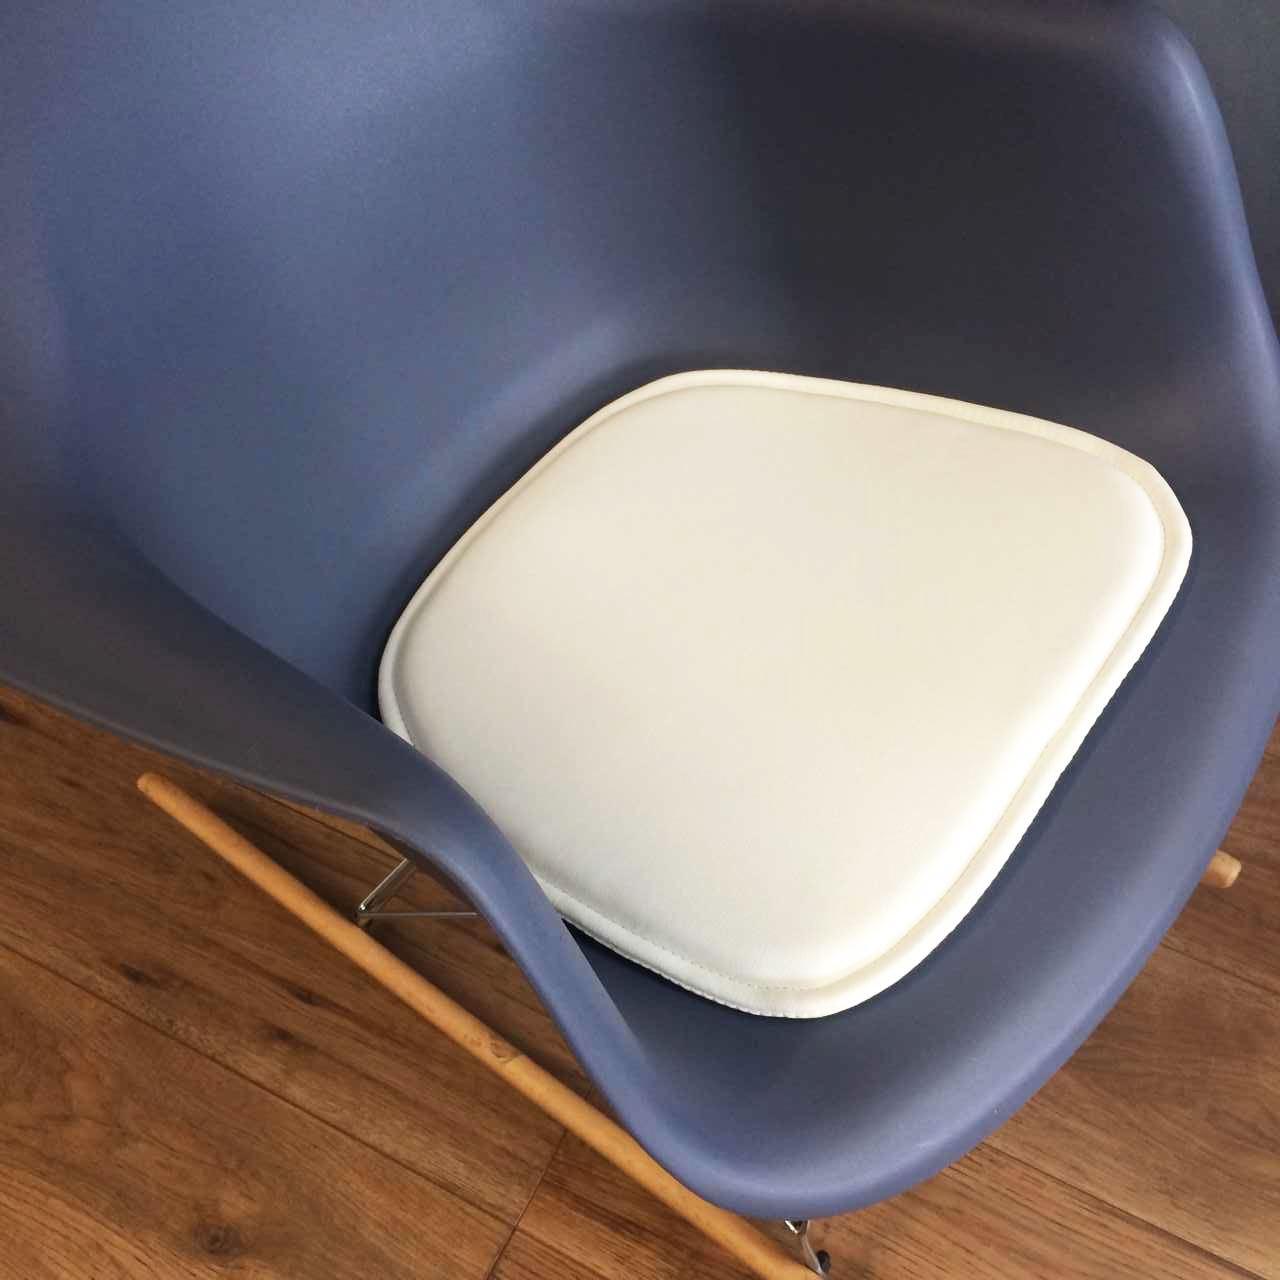 Charles Eames Faux Leather Seat Pad Cushions Compatible With DAW DAR RAR Chai